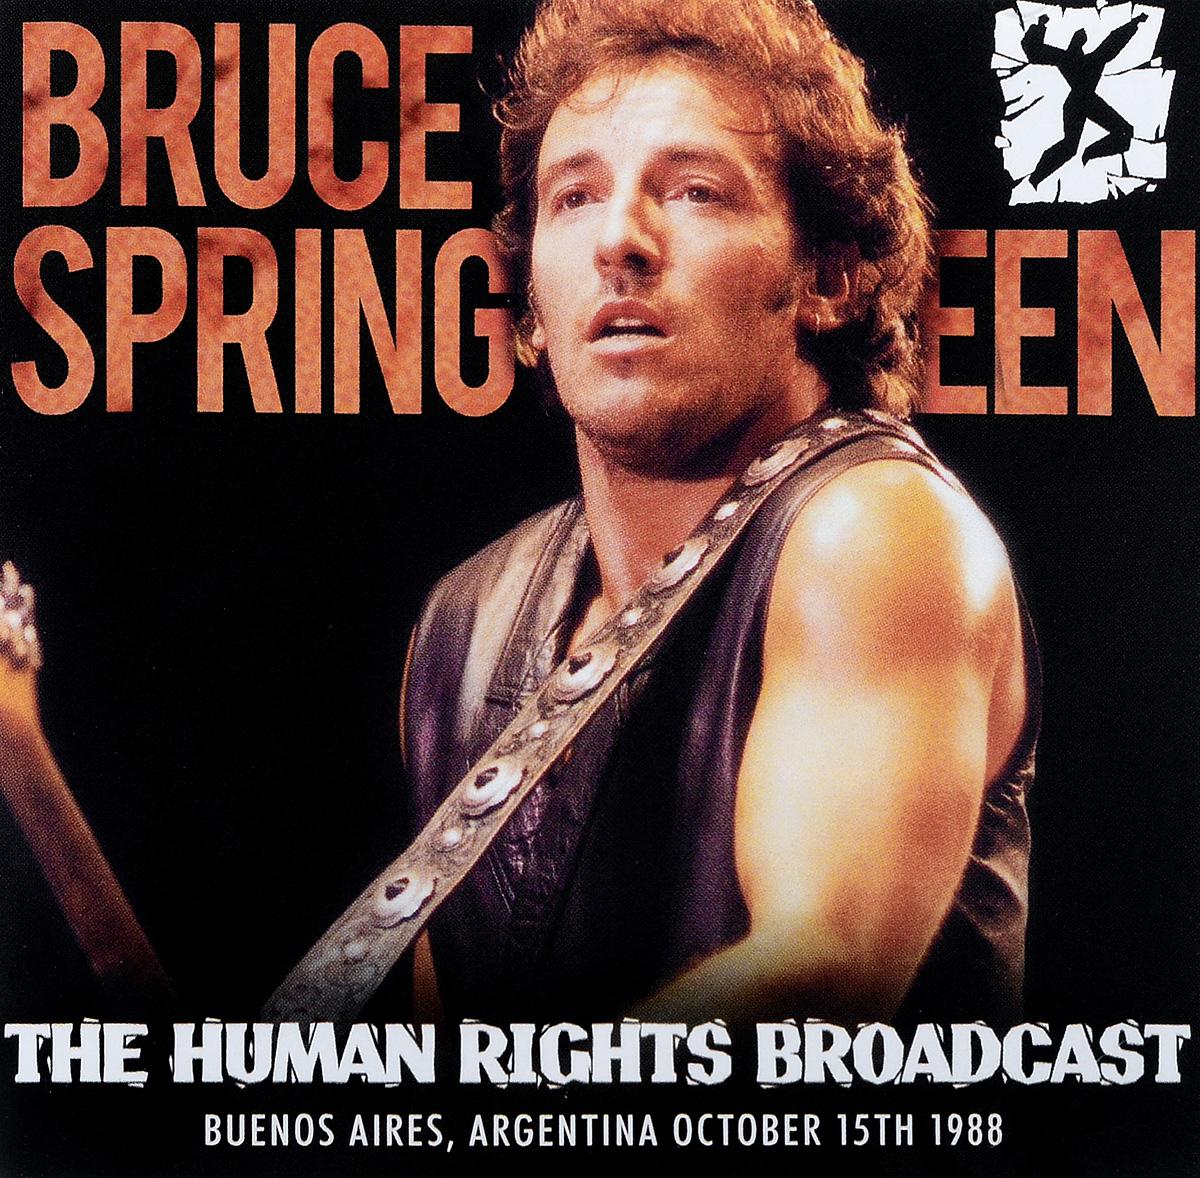 Брюс Спрингстин Bruce Springsteen. The Human Rights Broadcast брюс спрингстин bruce springsteen born to run remastered